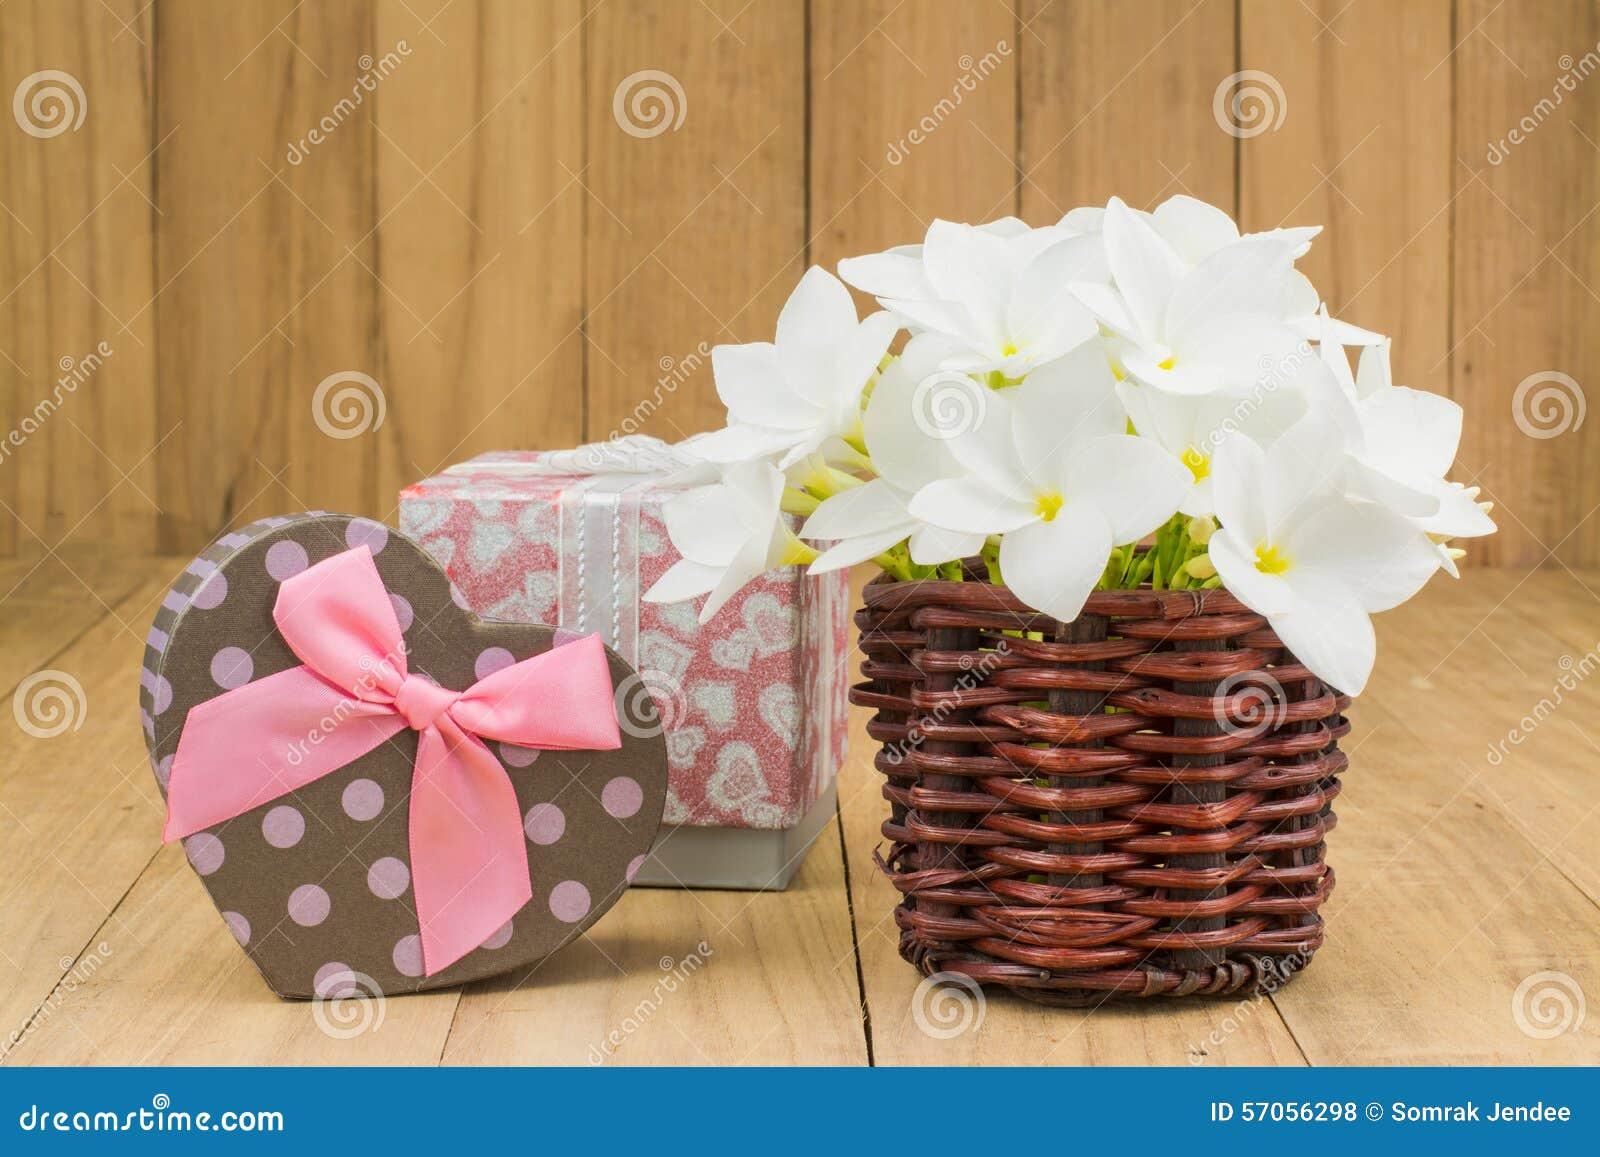 Rode frangipani (plumaria) bloem